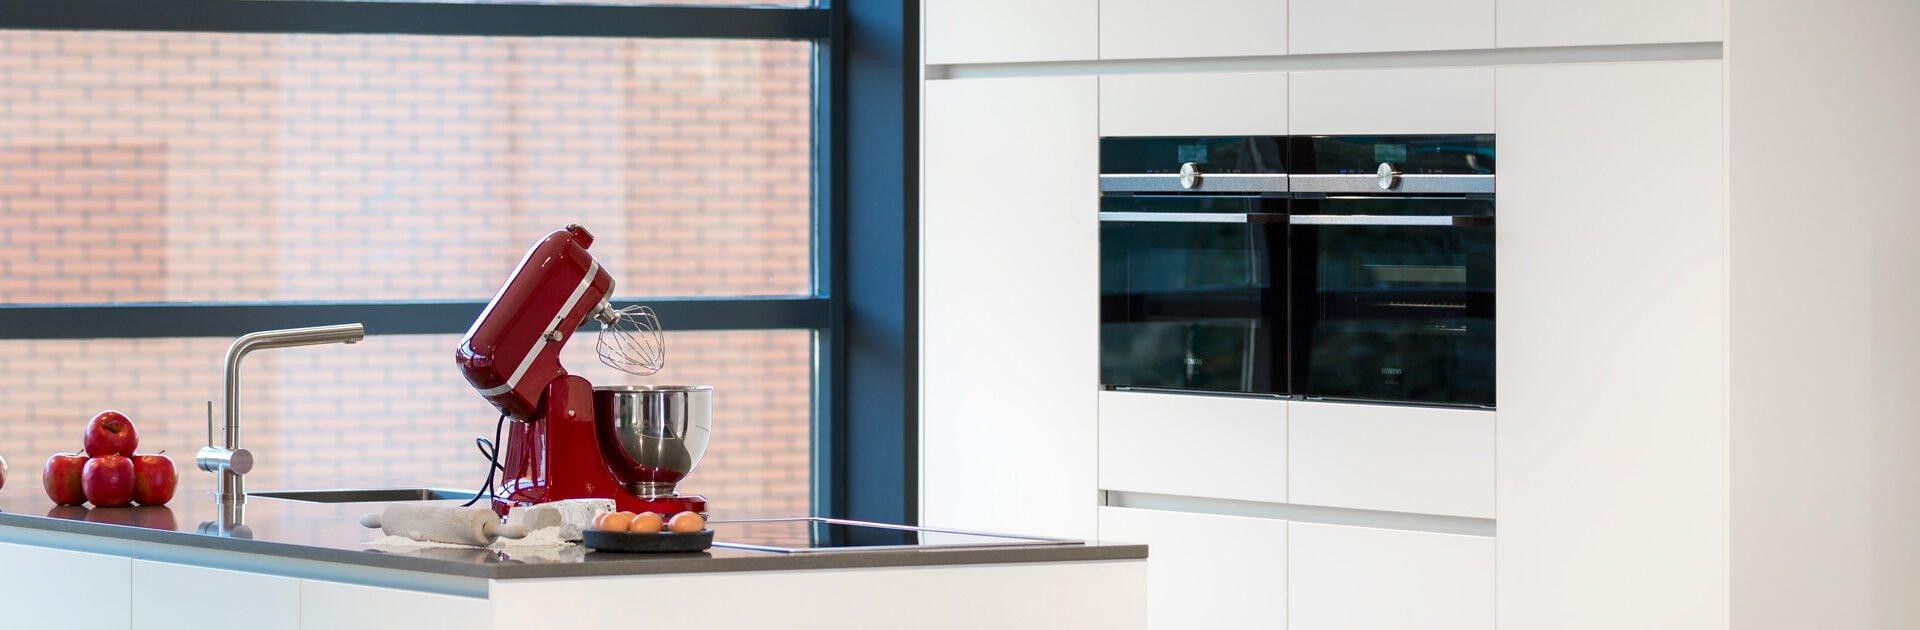 Slimme Siemens keukenapparaten | Satink Keukens